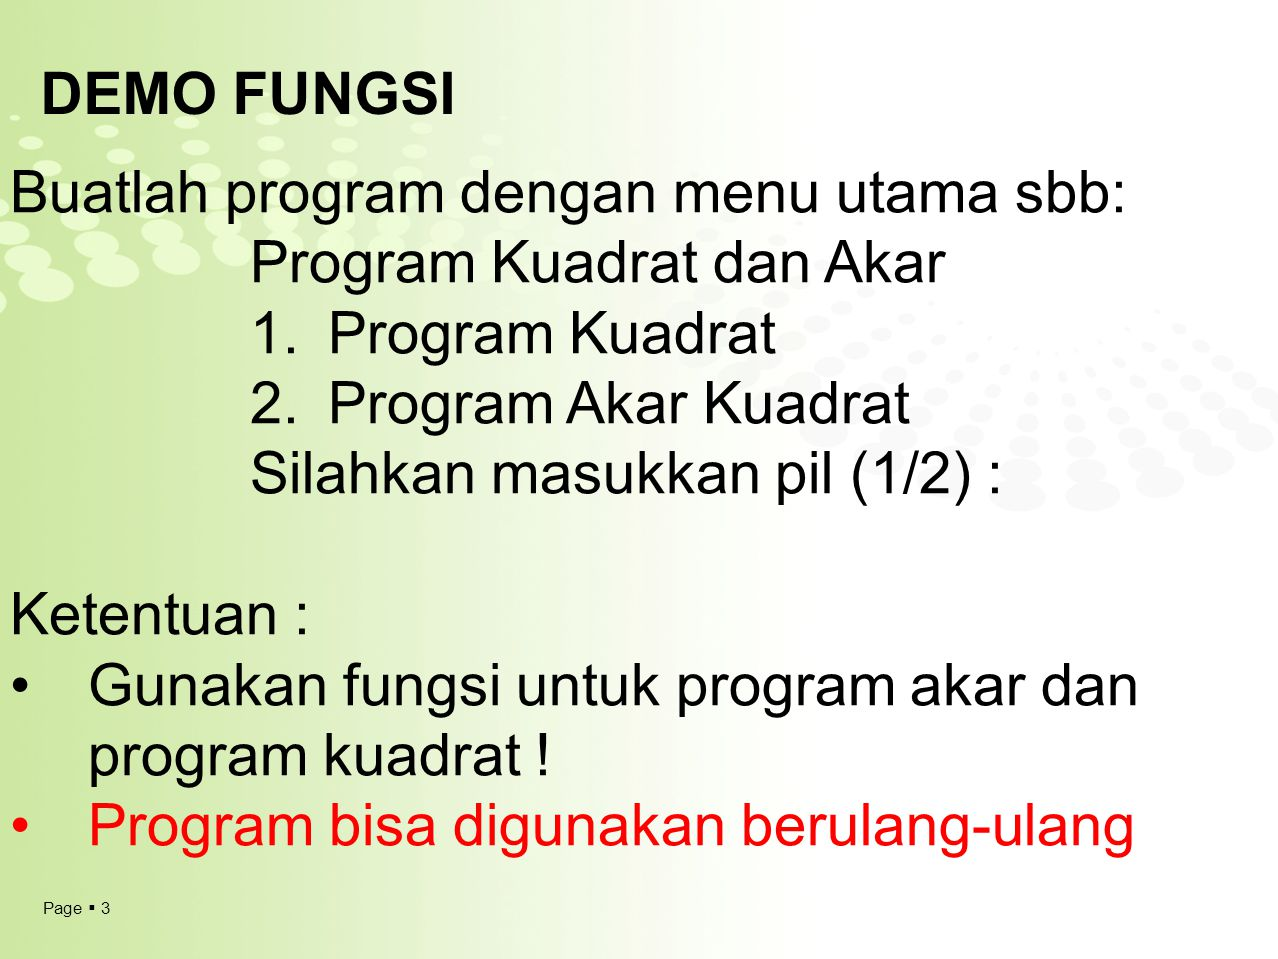 Page  4 Latihan FUNGSI 1 Buatlah program dengan menu utama sbb : Program HITUNG sederhana 1.TAMBAH 2.KURANG 3.KALI 4.BAGI Silahkan Masukkan Pilihan (1/2/3/4) : Ketentuan : Input : Nilai1 dan Nilai2 Gunakan fungsi untuk program akar dan program kuadrat !